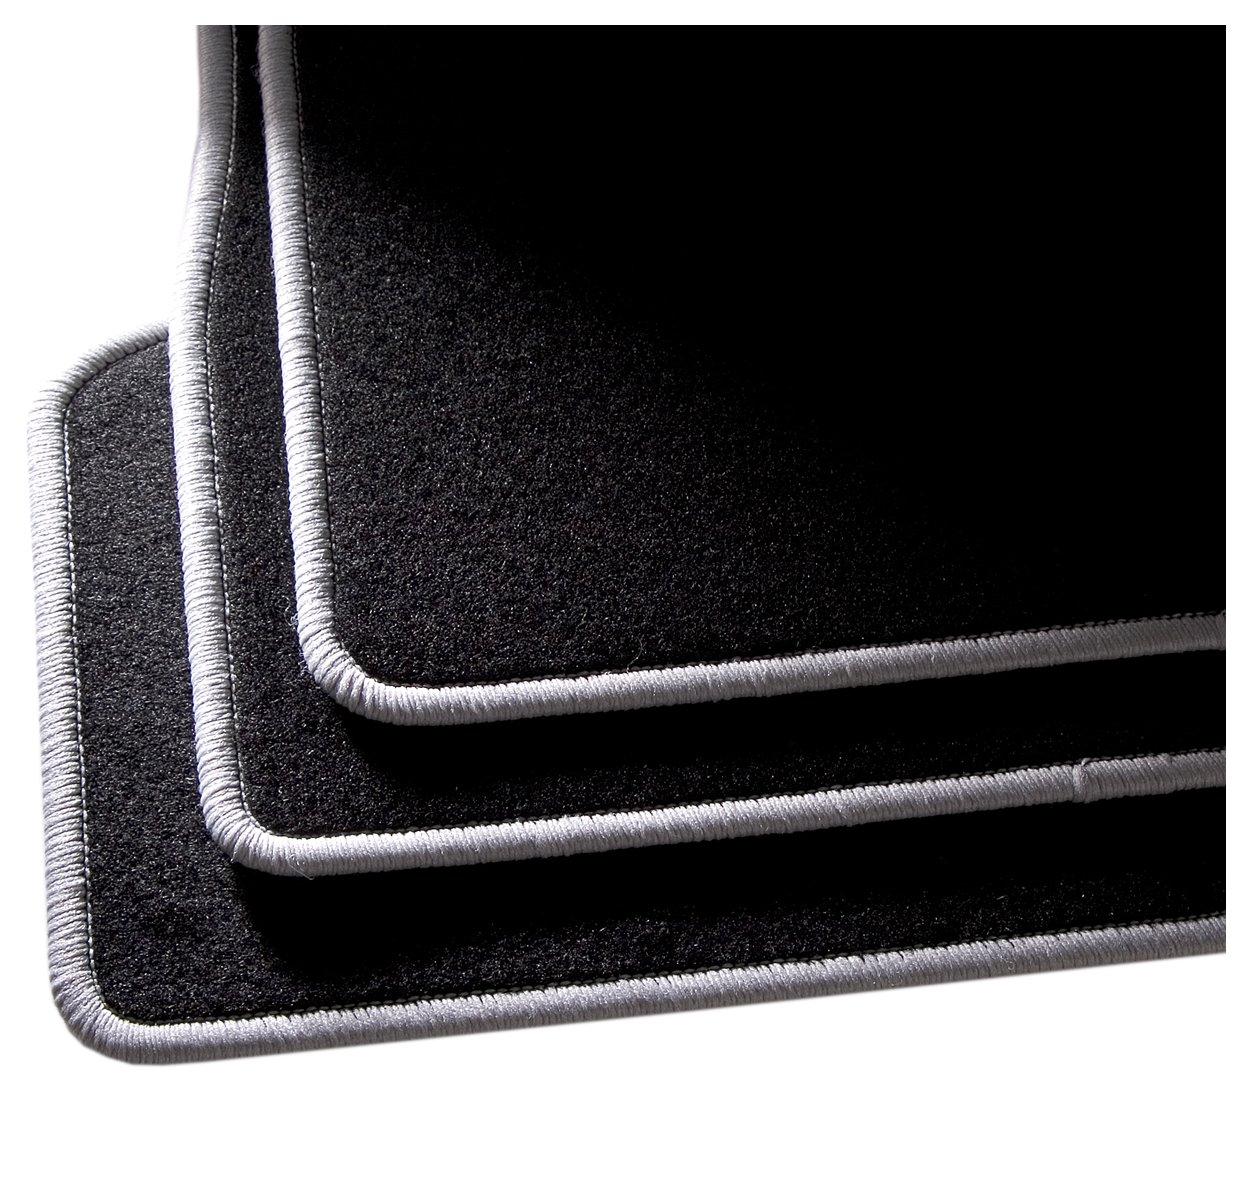 CarFashion 255027 Auto Alfombra Soporte sin Juego de alfombrillas para Matte plana BasicRips-Textil Negro 4-Piezas